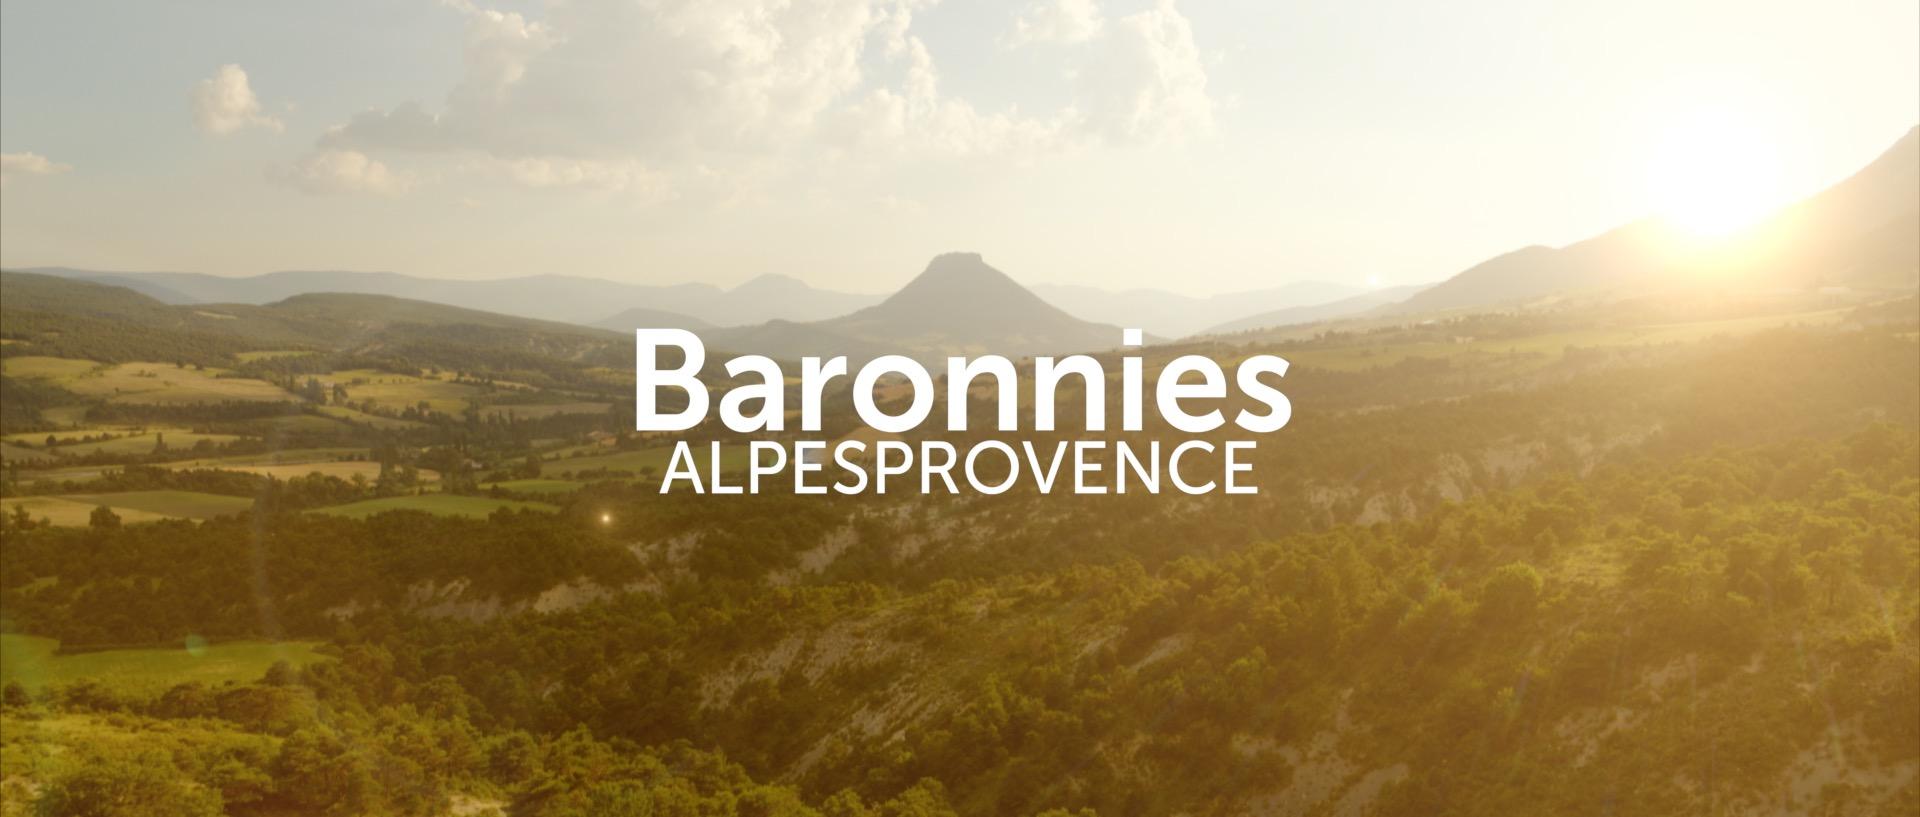 baronnies_alpes_provence_01.jpg